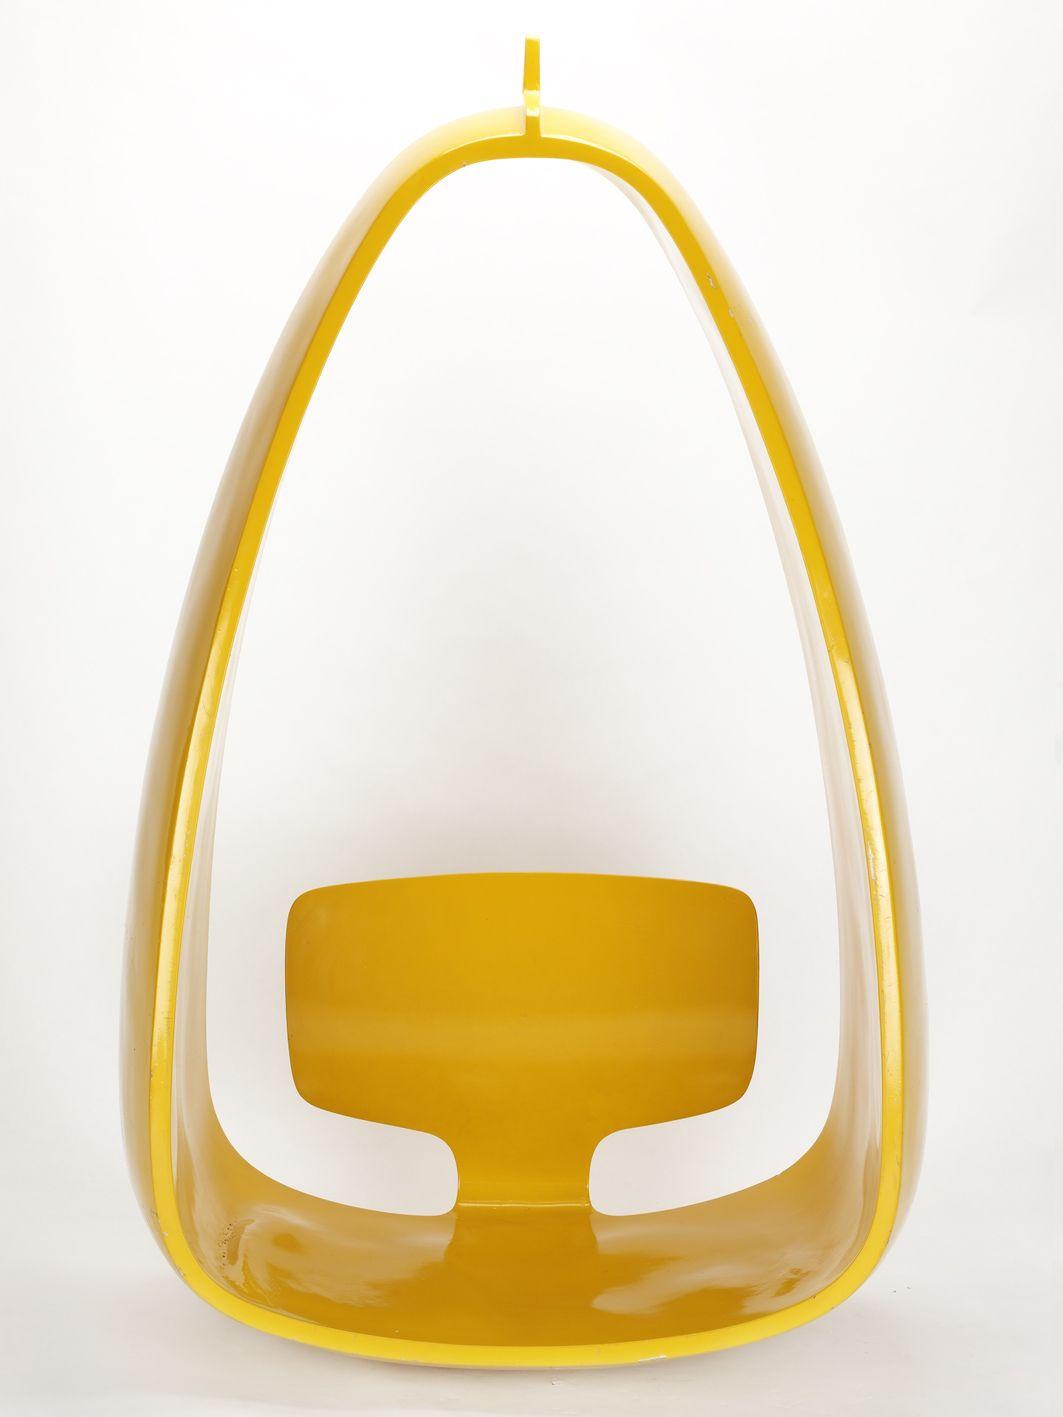 Hängesitz yellow mod chair retro moulded furniture